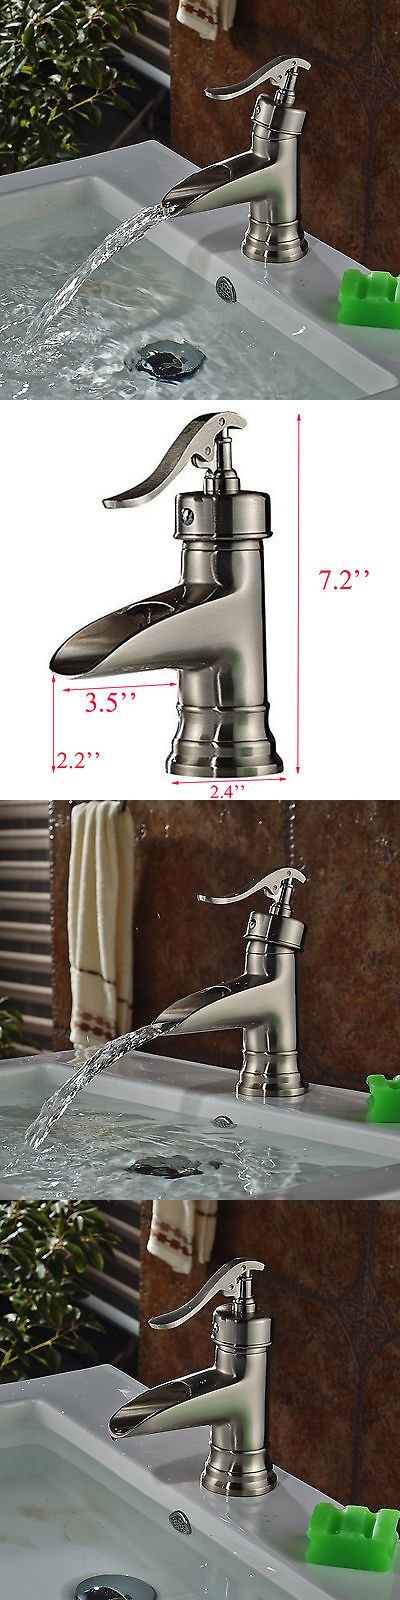 Best 25 Bathroom basin taps ideas on Pinterest Basins Bathroom